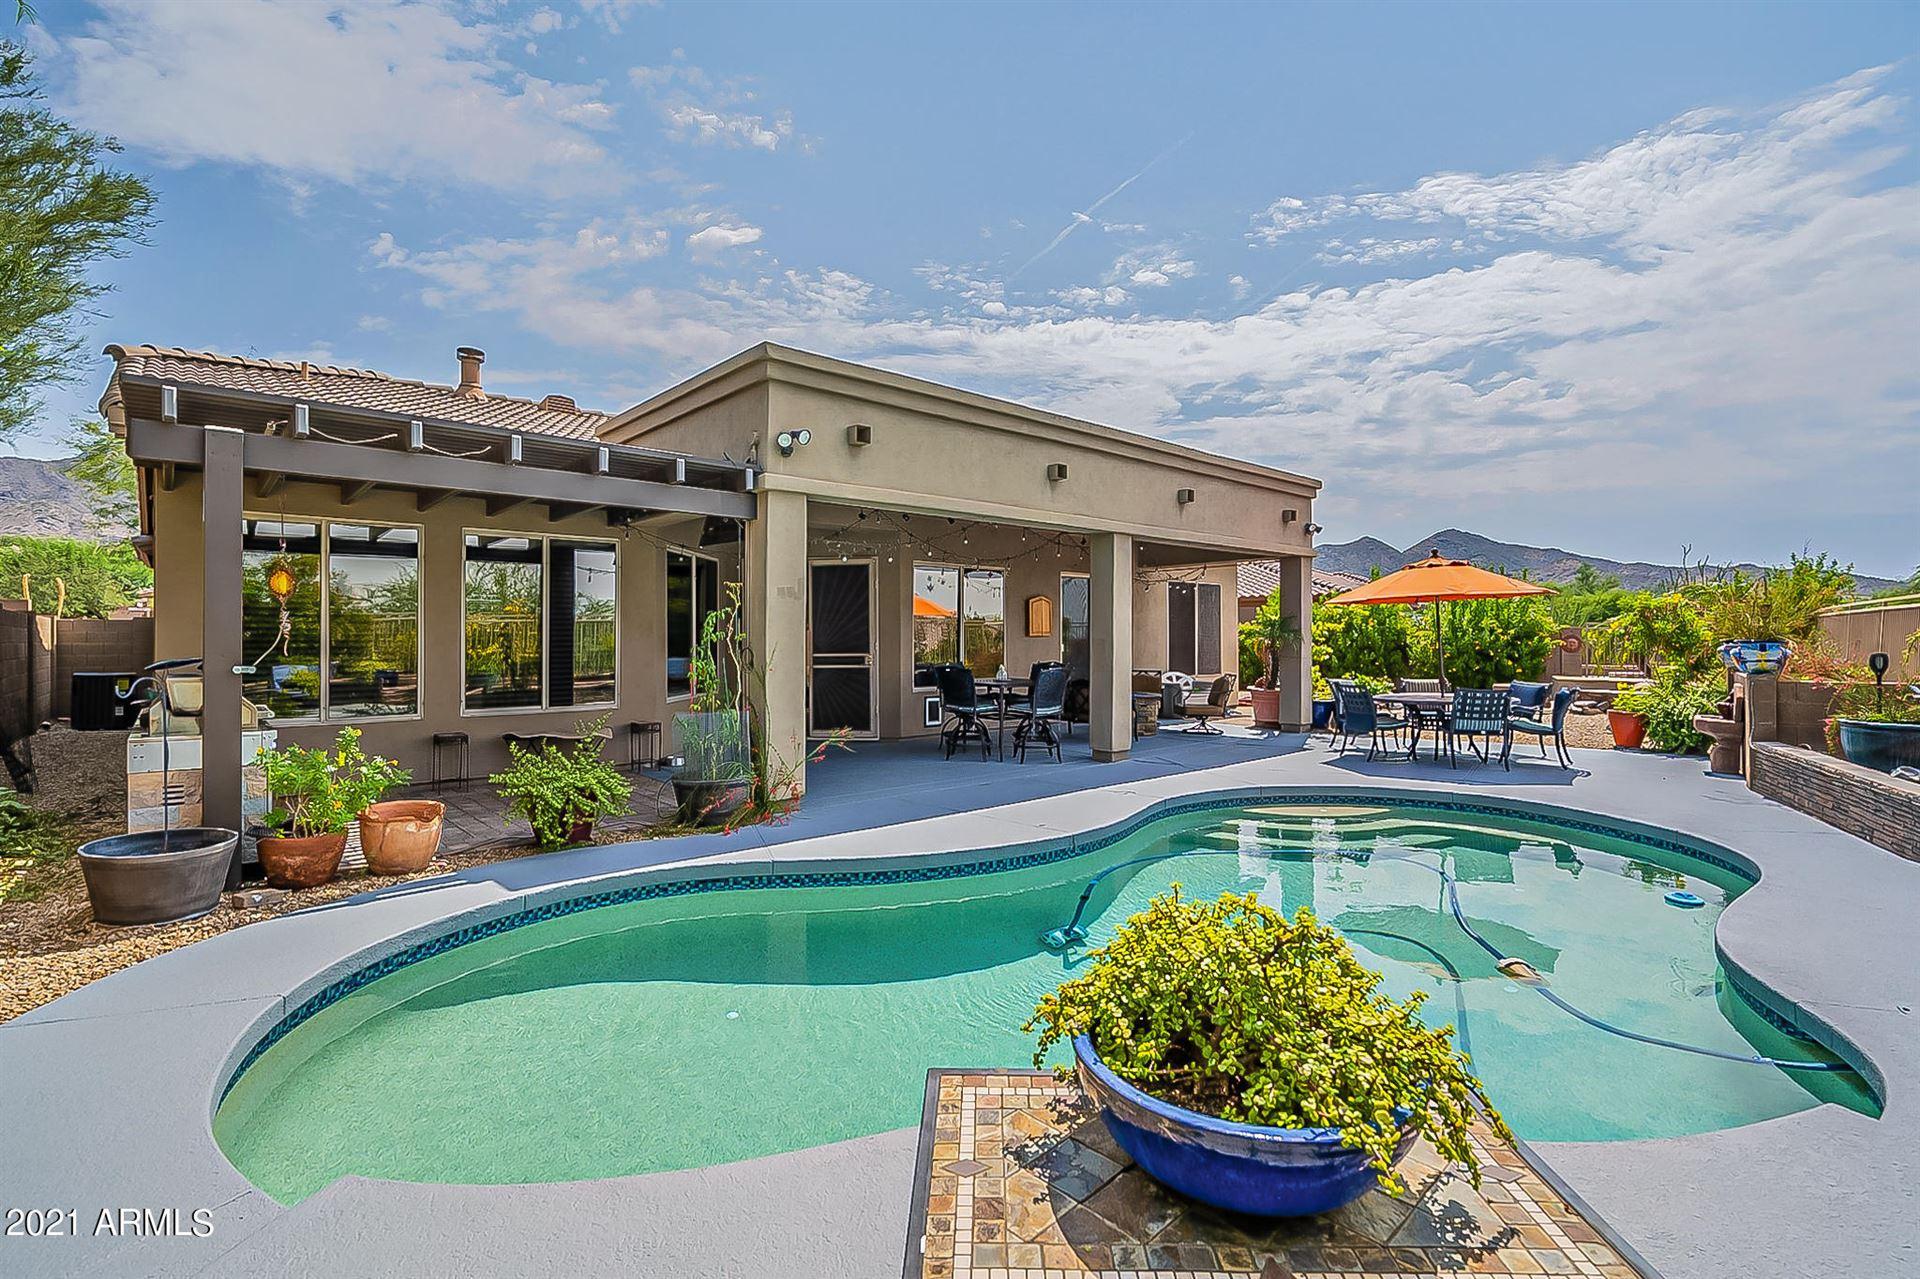 Photo of 10825 E ROSEMARY Lane, Scottsdale, AZ 85255 (MLS # 6270667)